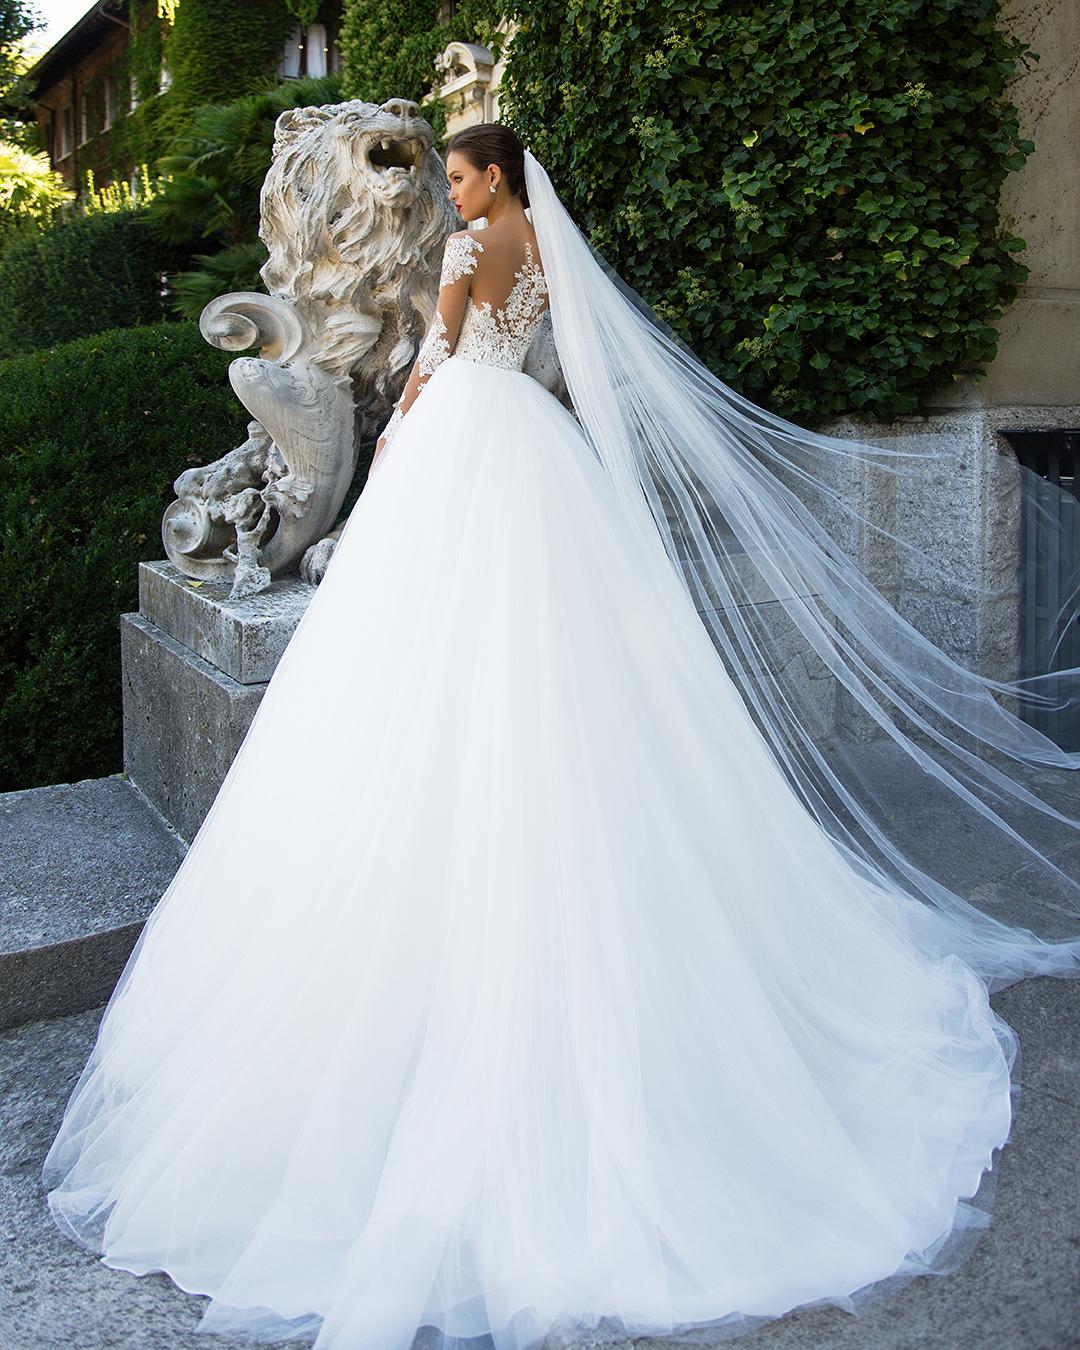 Millanova jersaey abiti da sposa il giardino della sposa - Il giardino della sposa ...